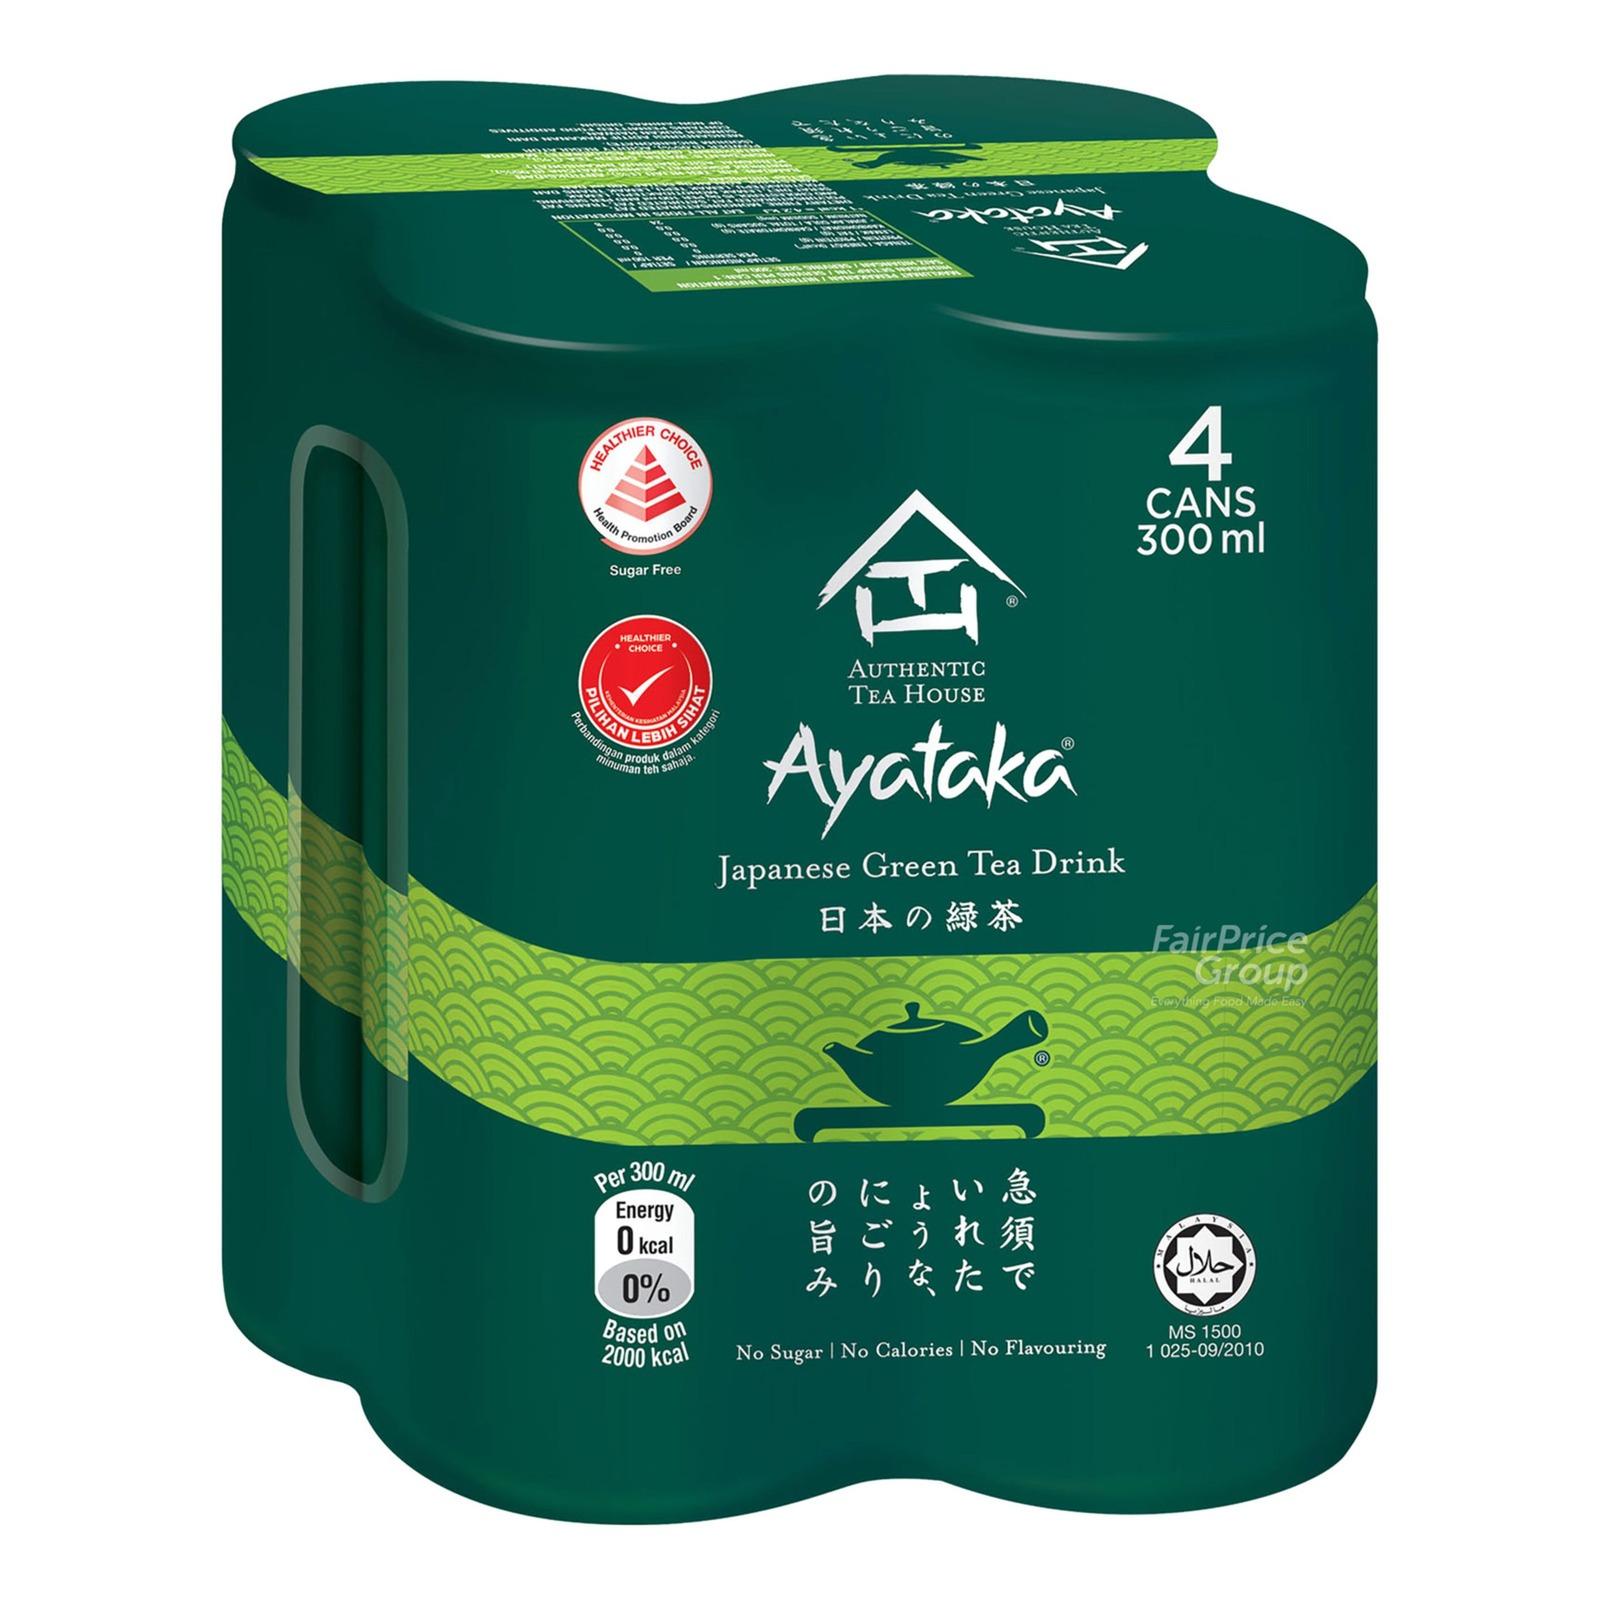 Authentic Tea House Ayataka No Sugar Japanese Green Tea (1.5L)